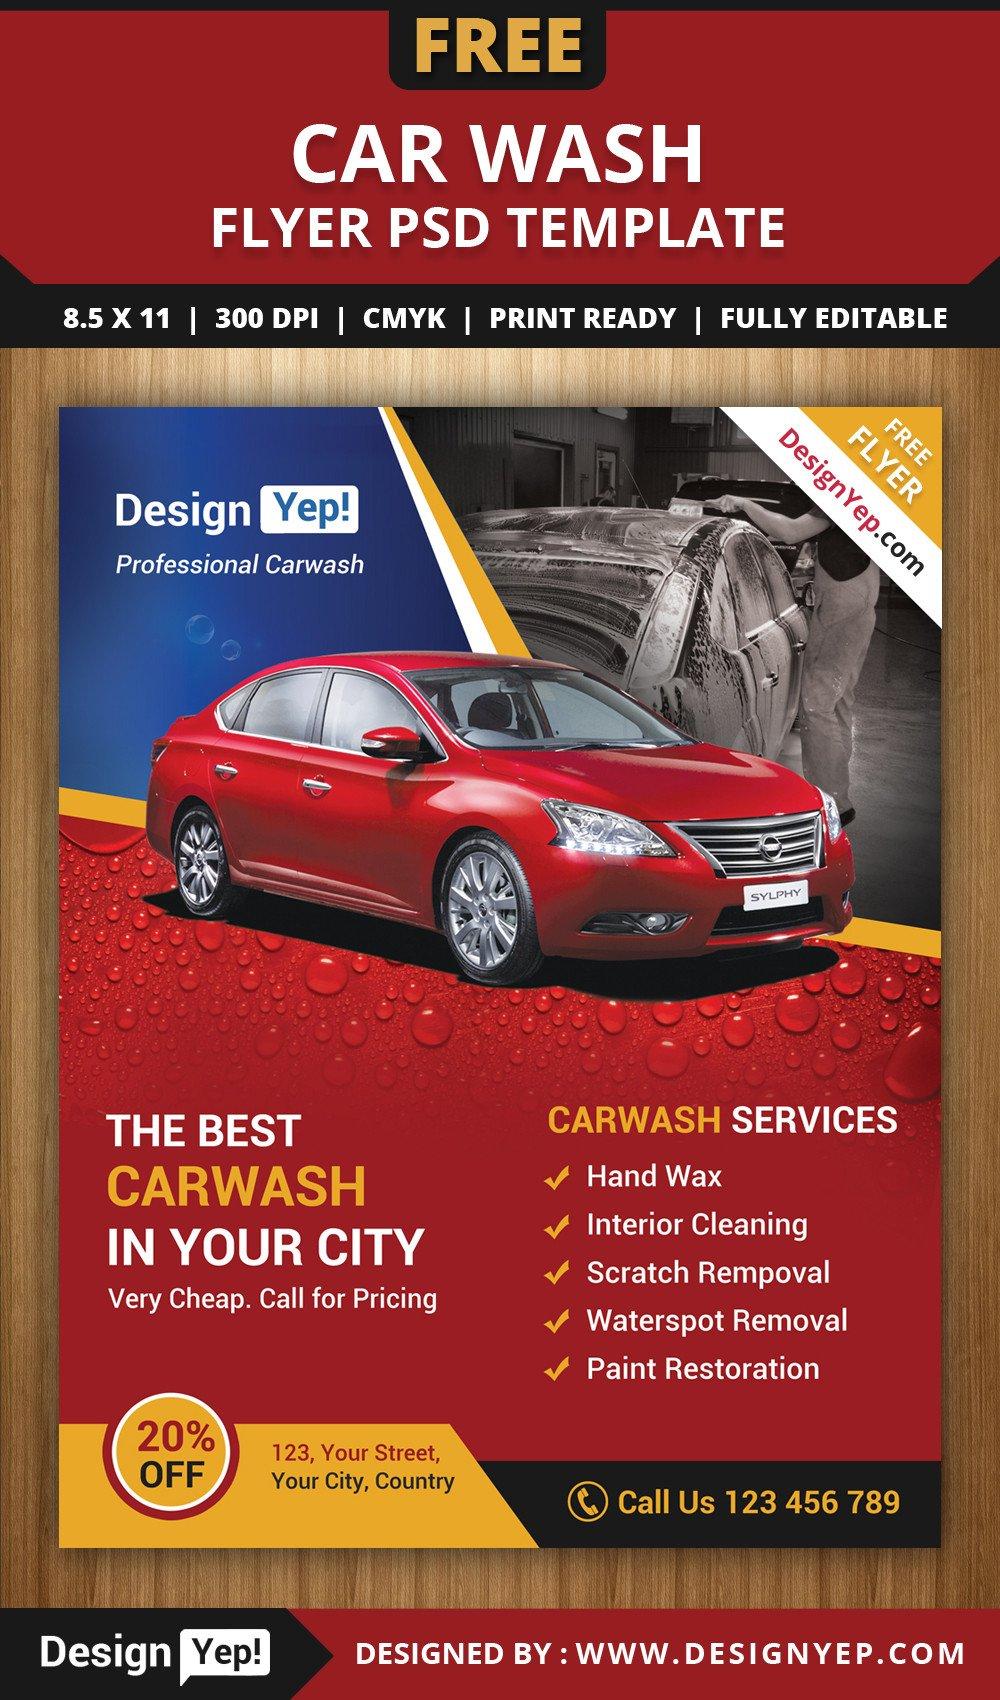 Auto Detailing Flyer Template Free Car Wash Flyer Psd Template Designyep